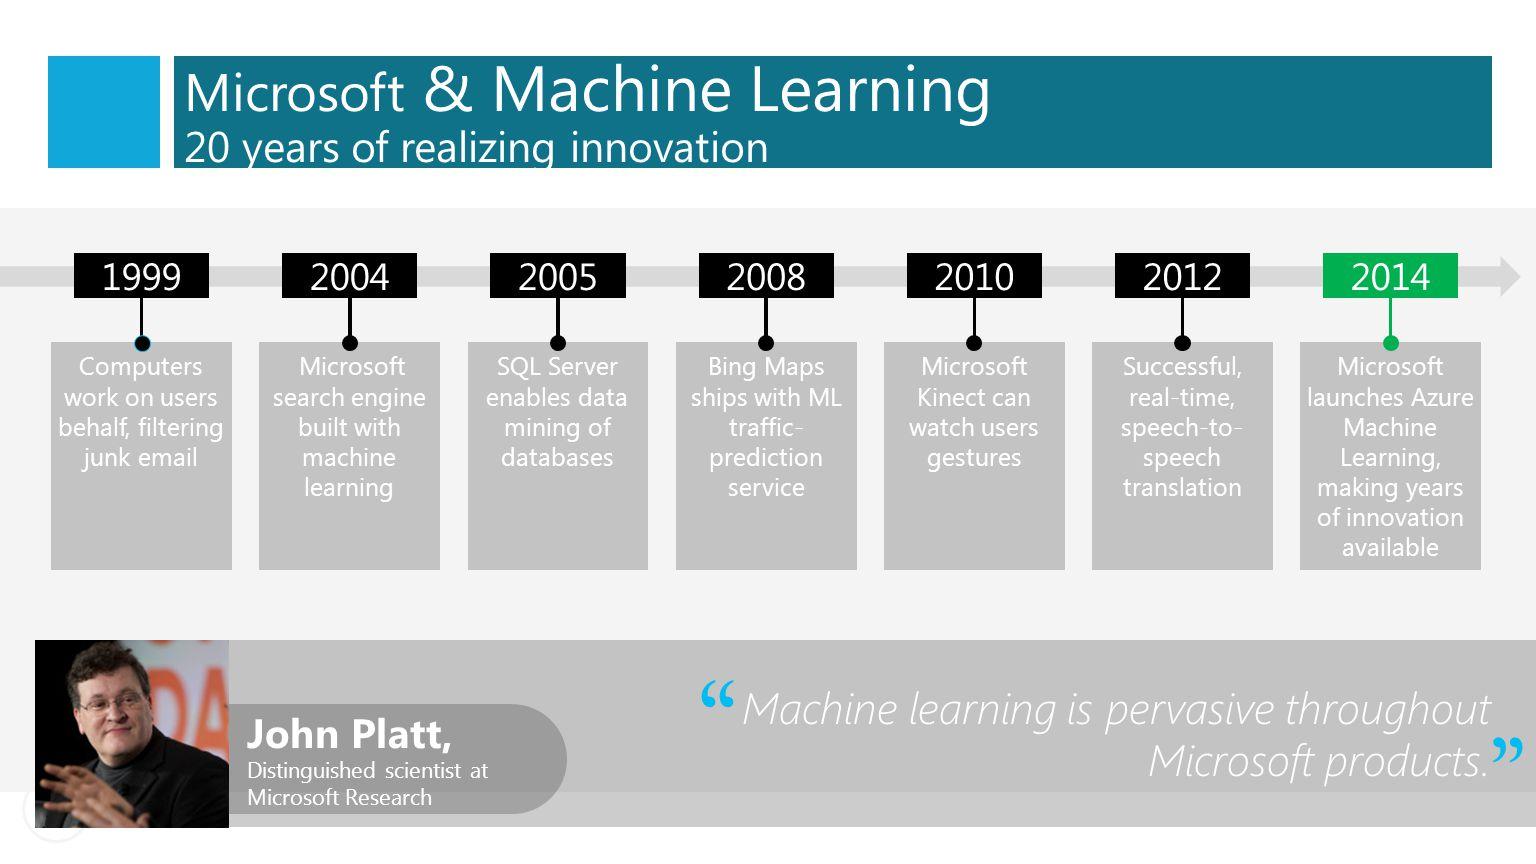 Microsoft & Machine Learning 20 years of realizing innovation